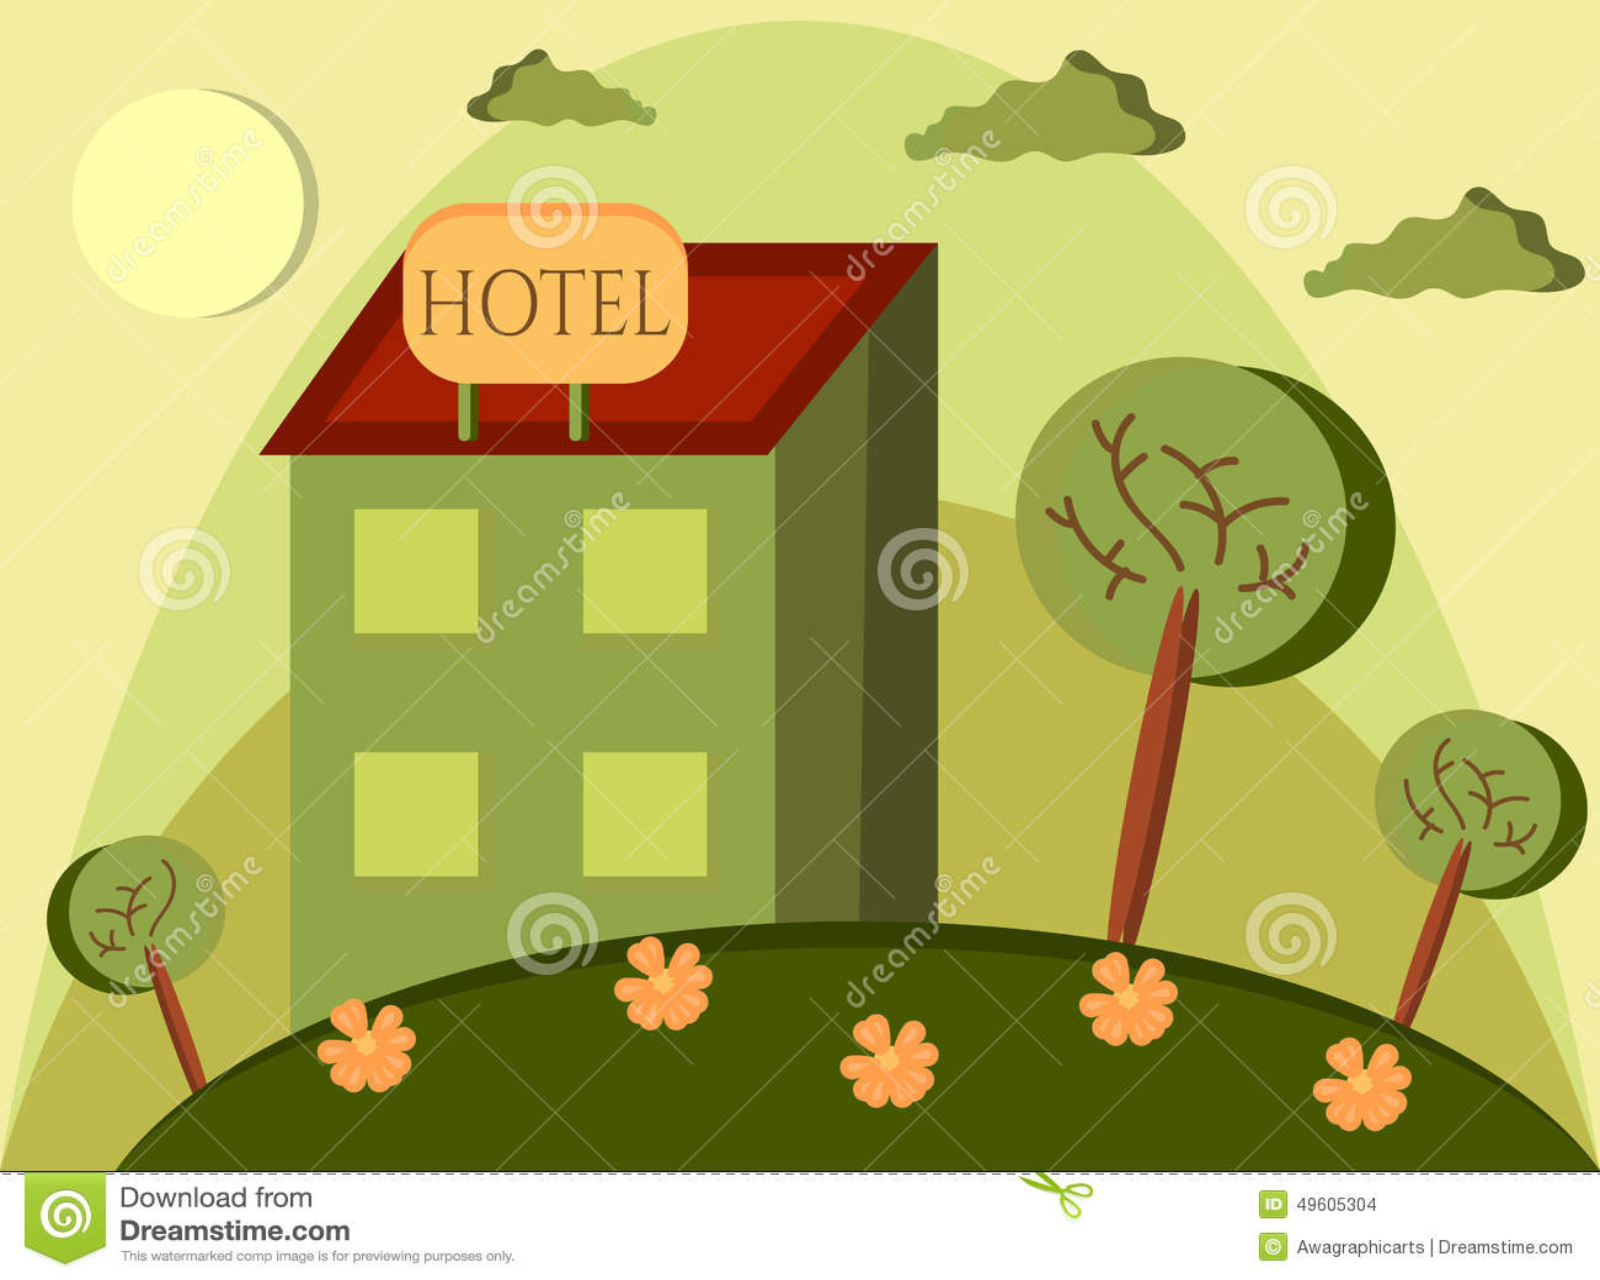 Funny Cartoon Of Hotel Stock Vector - Image: 49605304